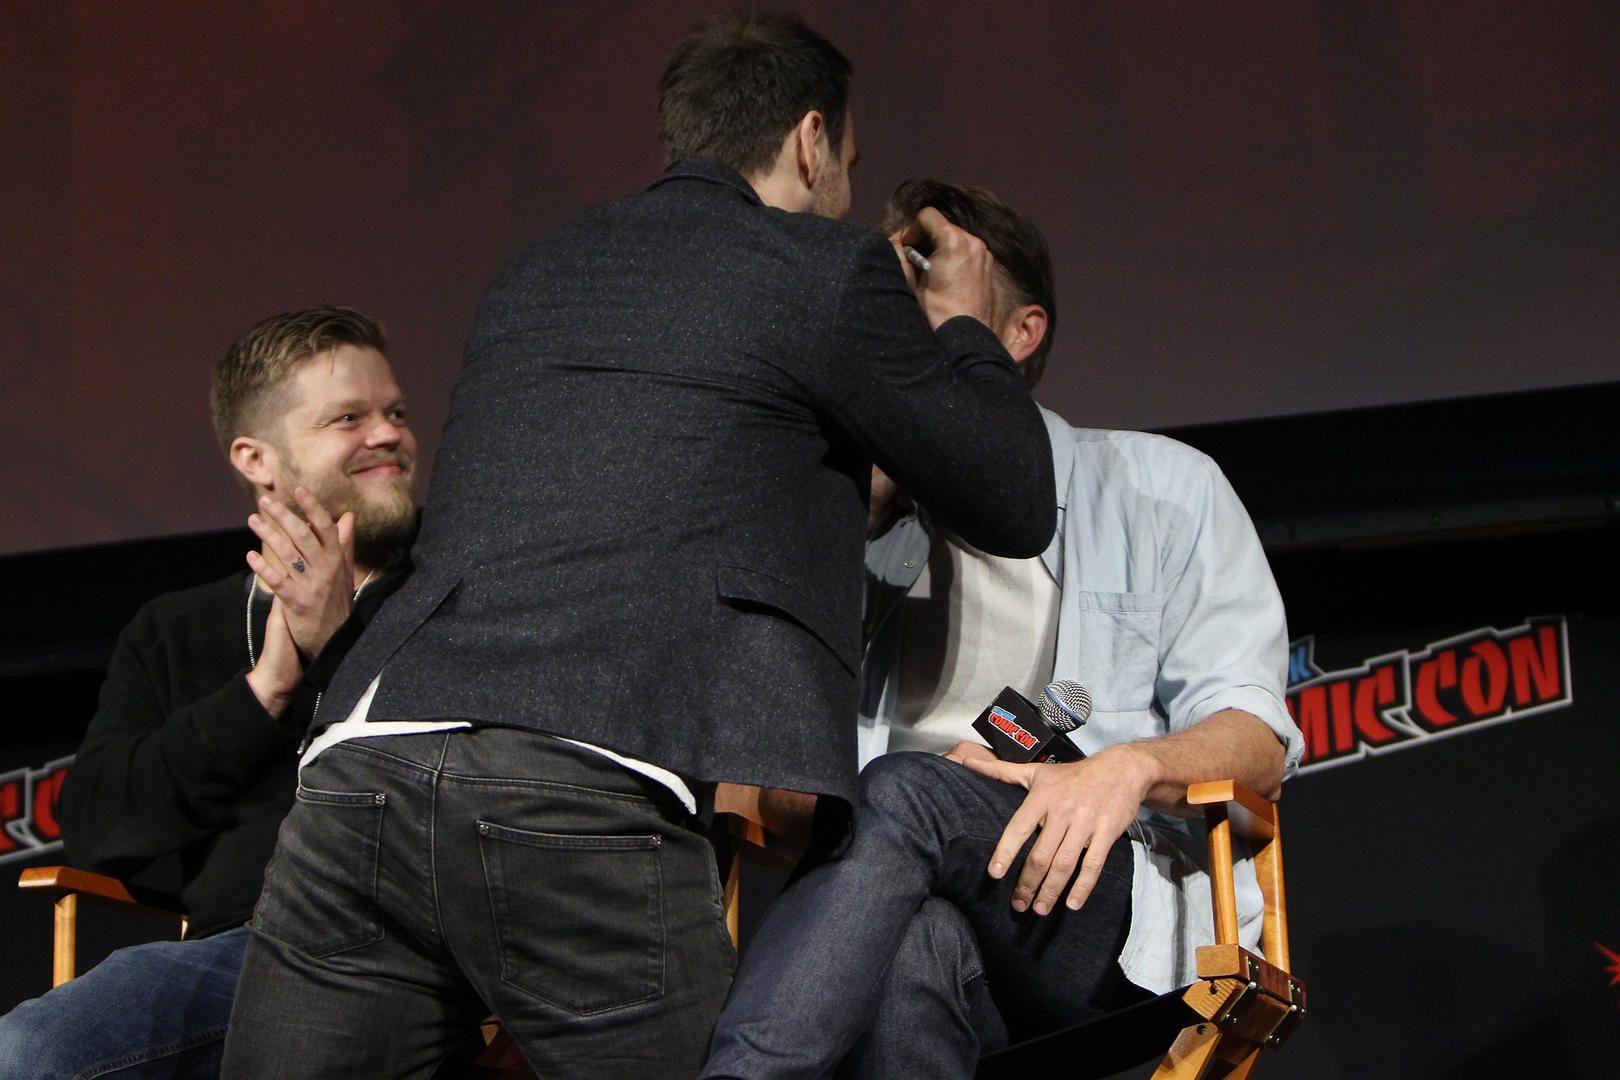 Netflix Original Series Marvel's Daredevil Season 3 Panel at New York Comic Con 2018